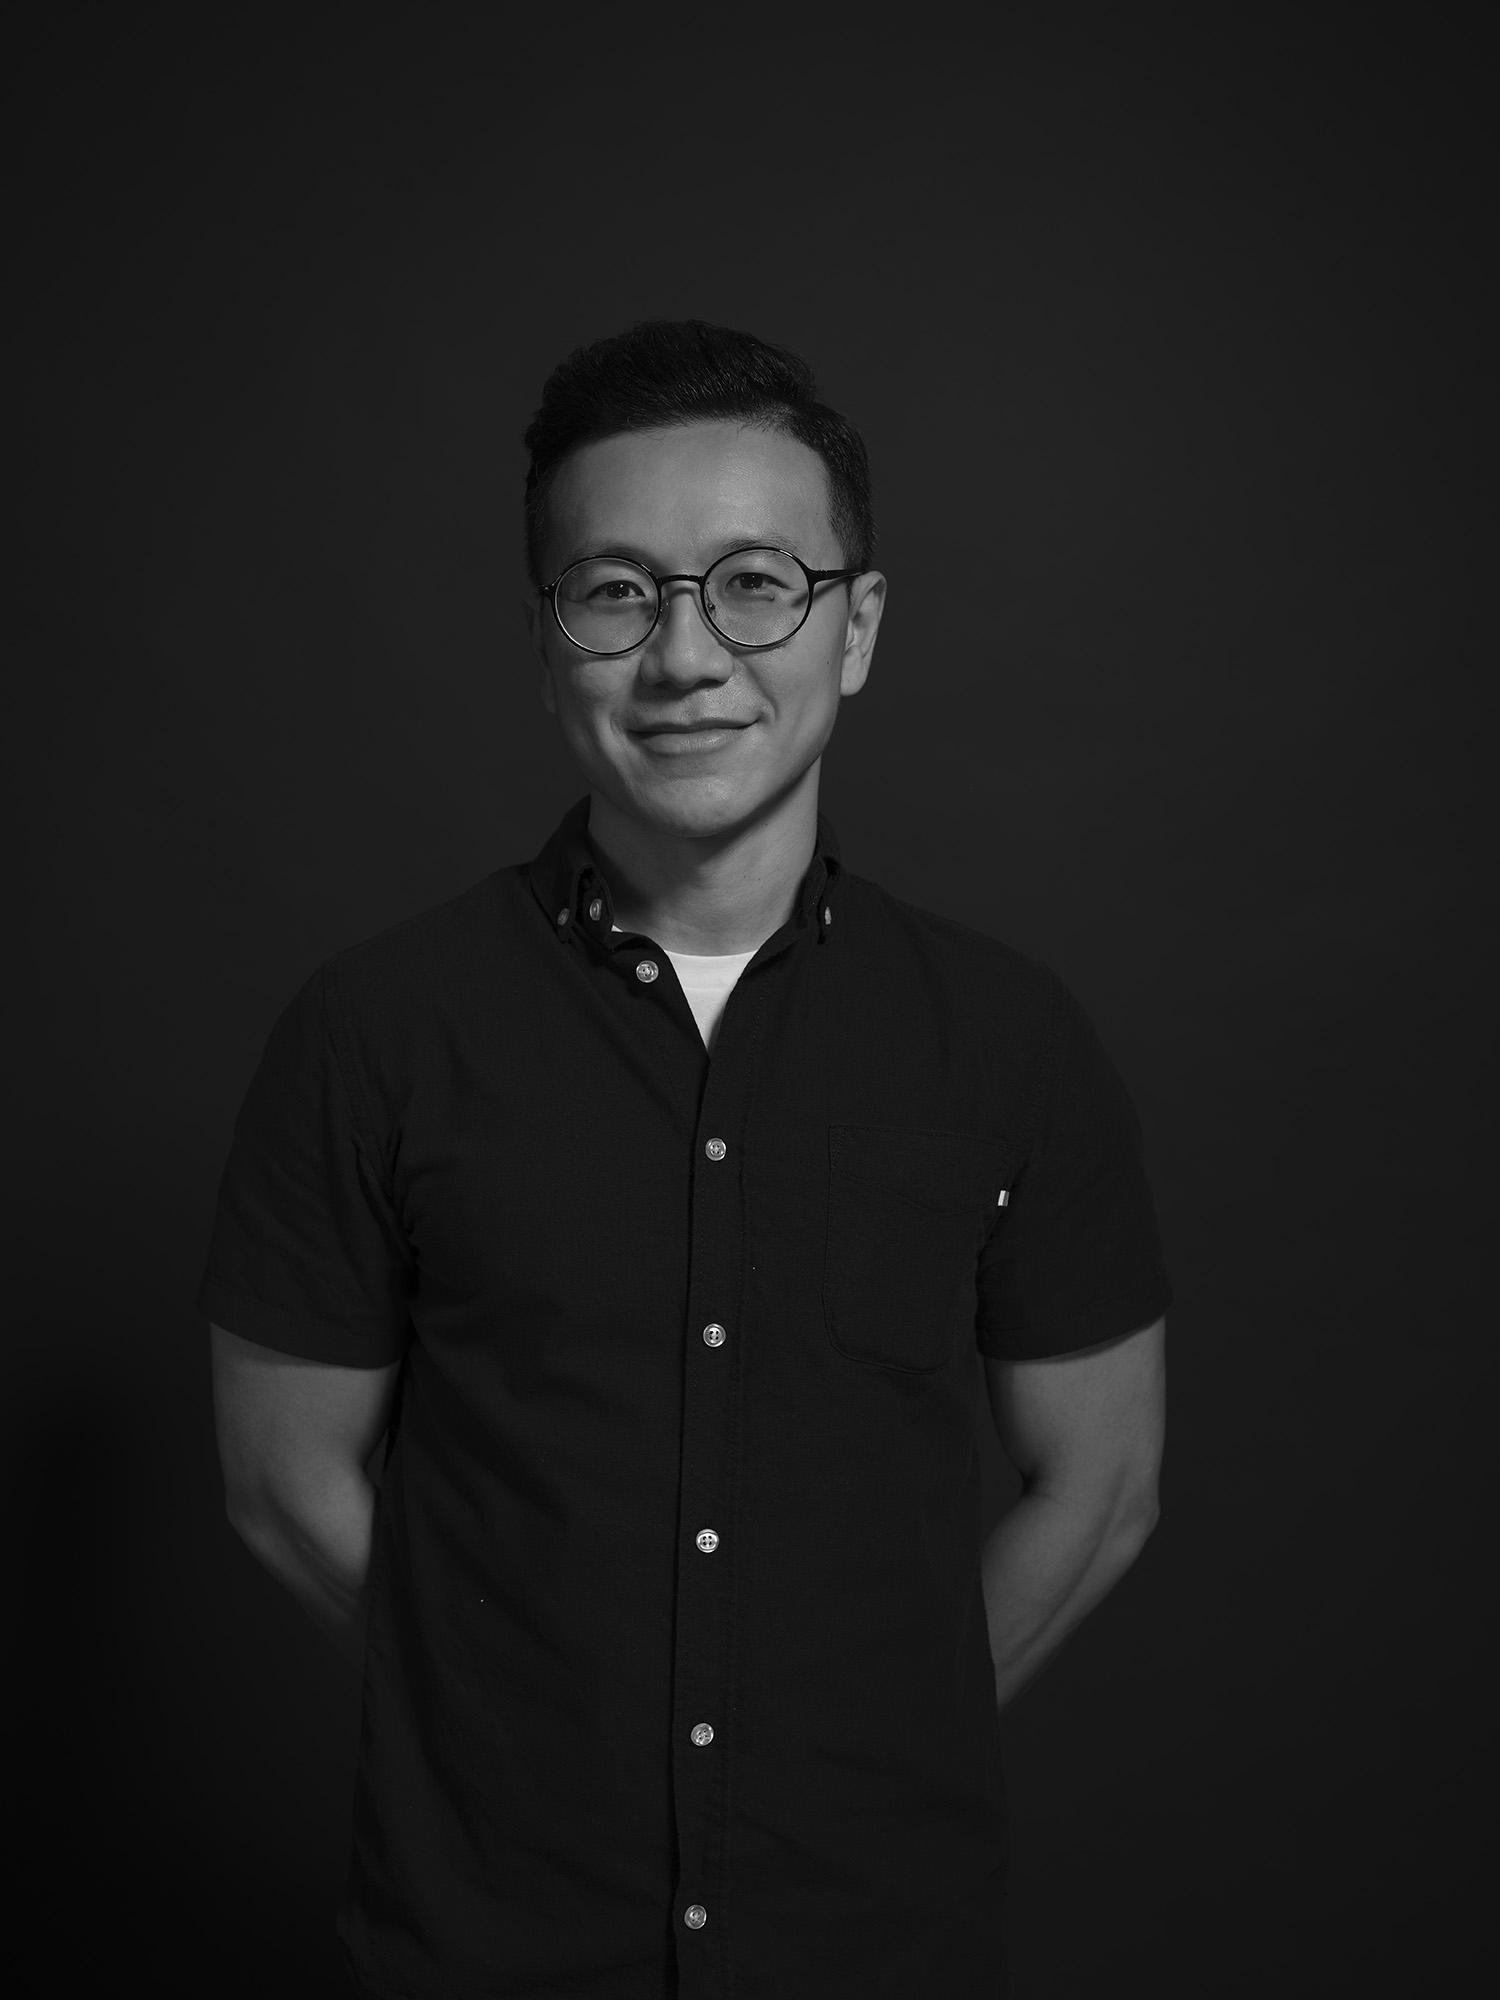 Ramboll Black and White Photography Portrait Photographer Singapore COCO Creative Studio 20